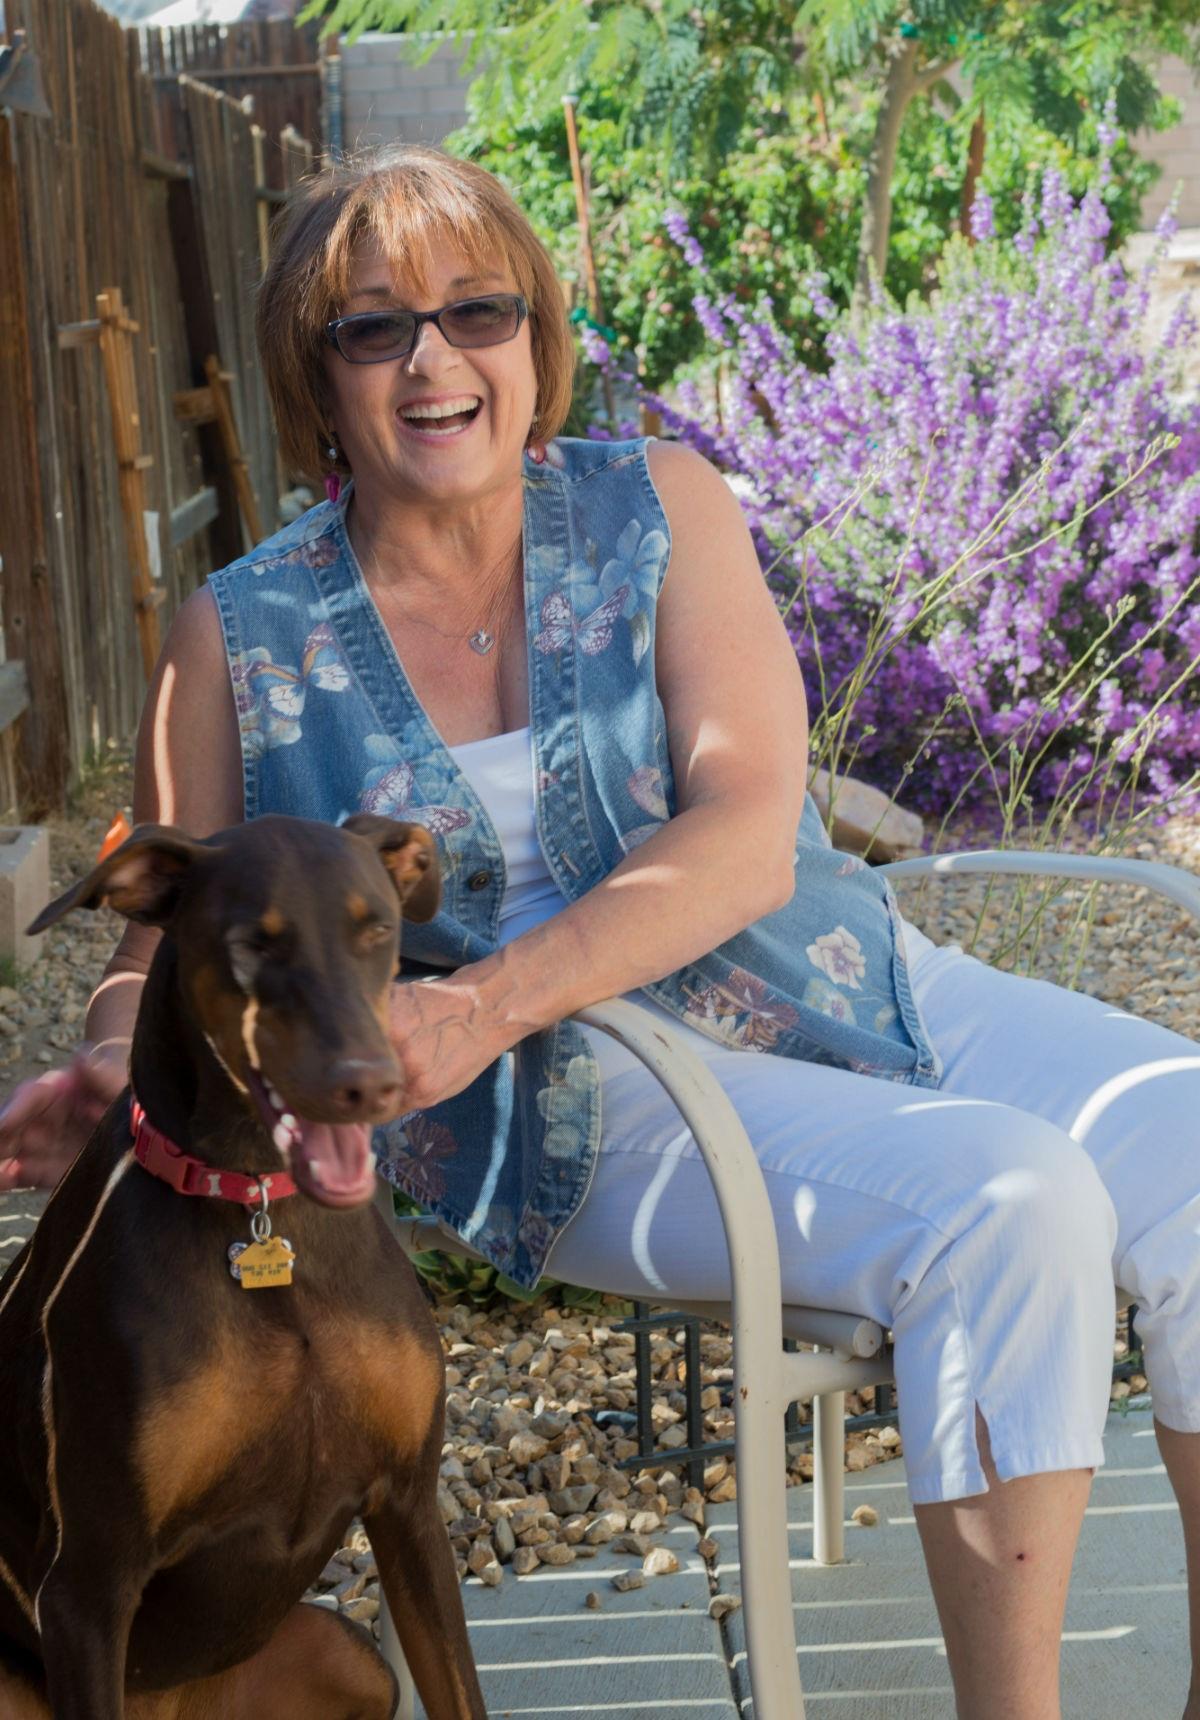 Former UFCW member Karyn Neeley